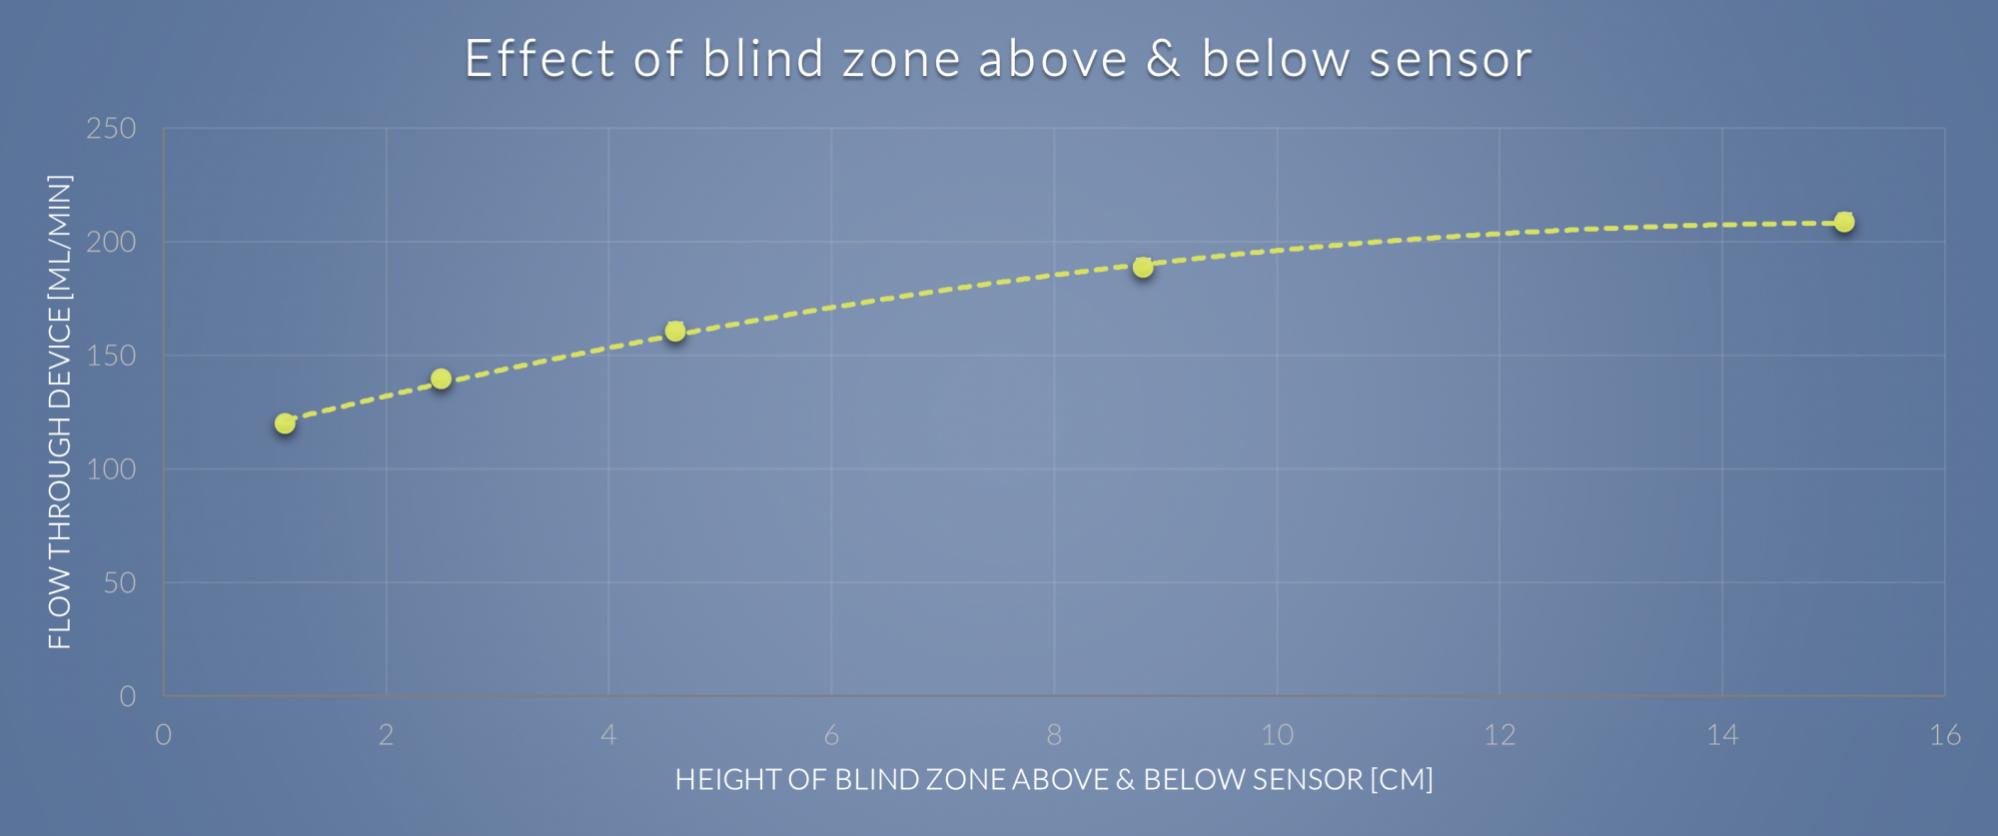 Effect of blind zone above and below iFLUX sensor